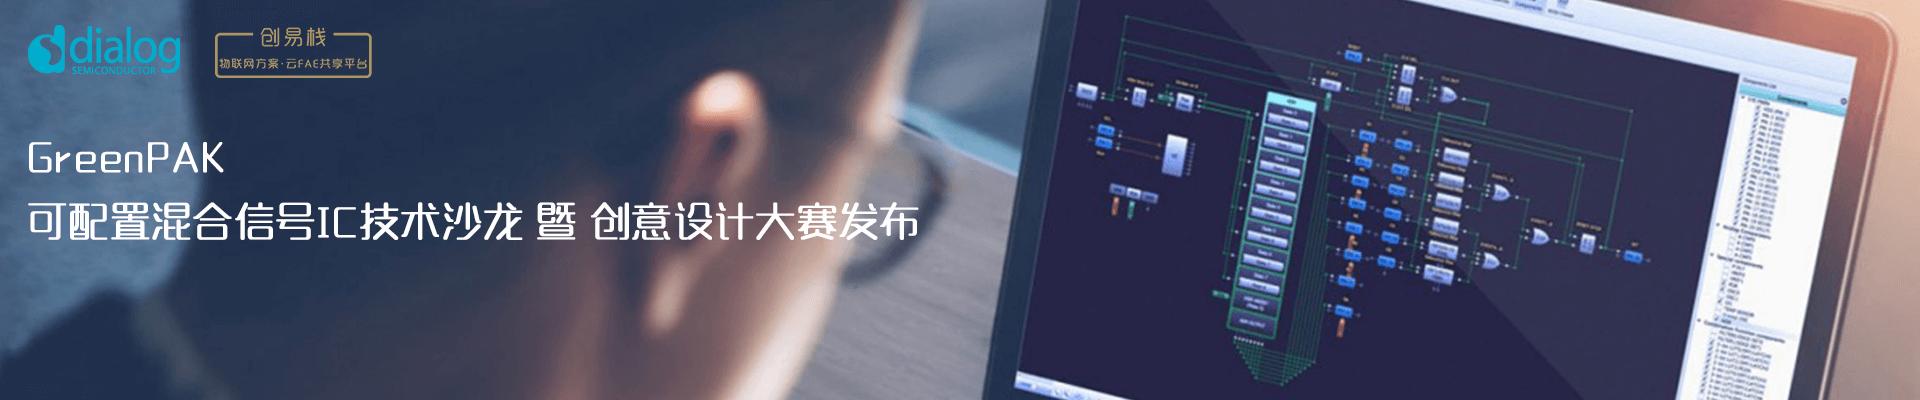 GreenPAK可编程混合信号IC技术沙龙